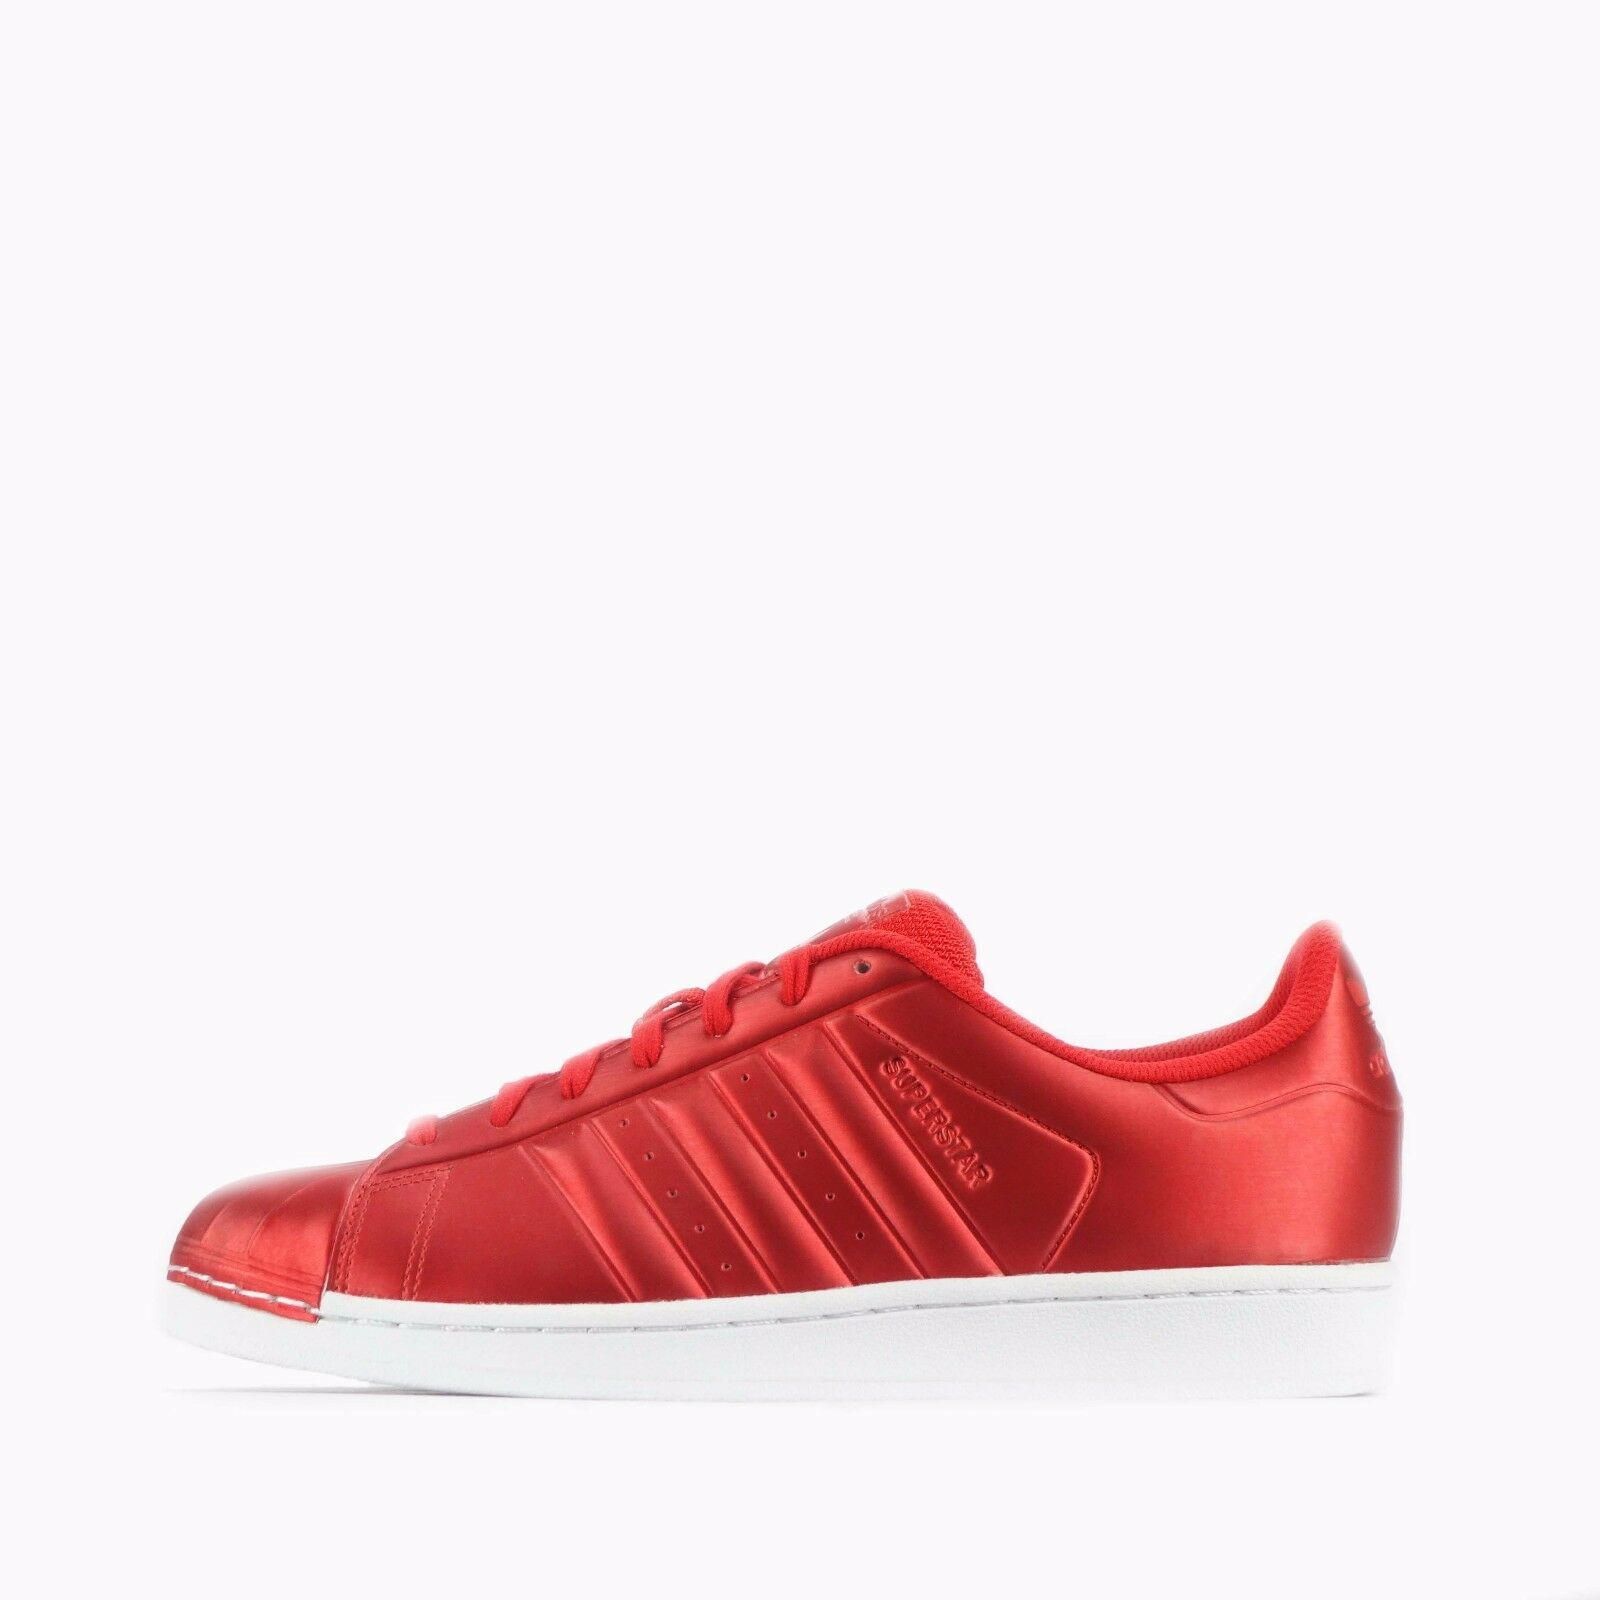 Adidas Originals Superstar Shell Tow Mens shoes Metallic Red